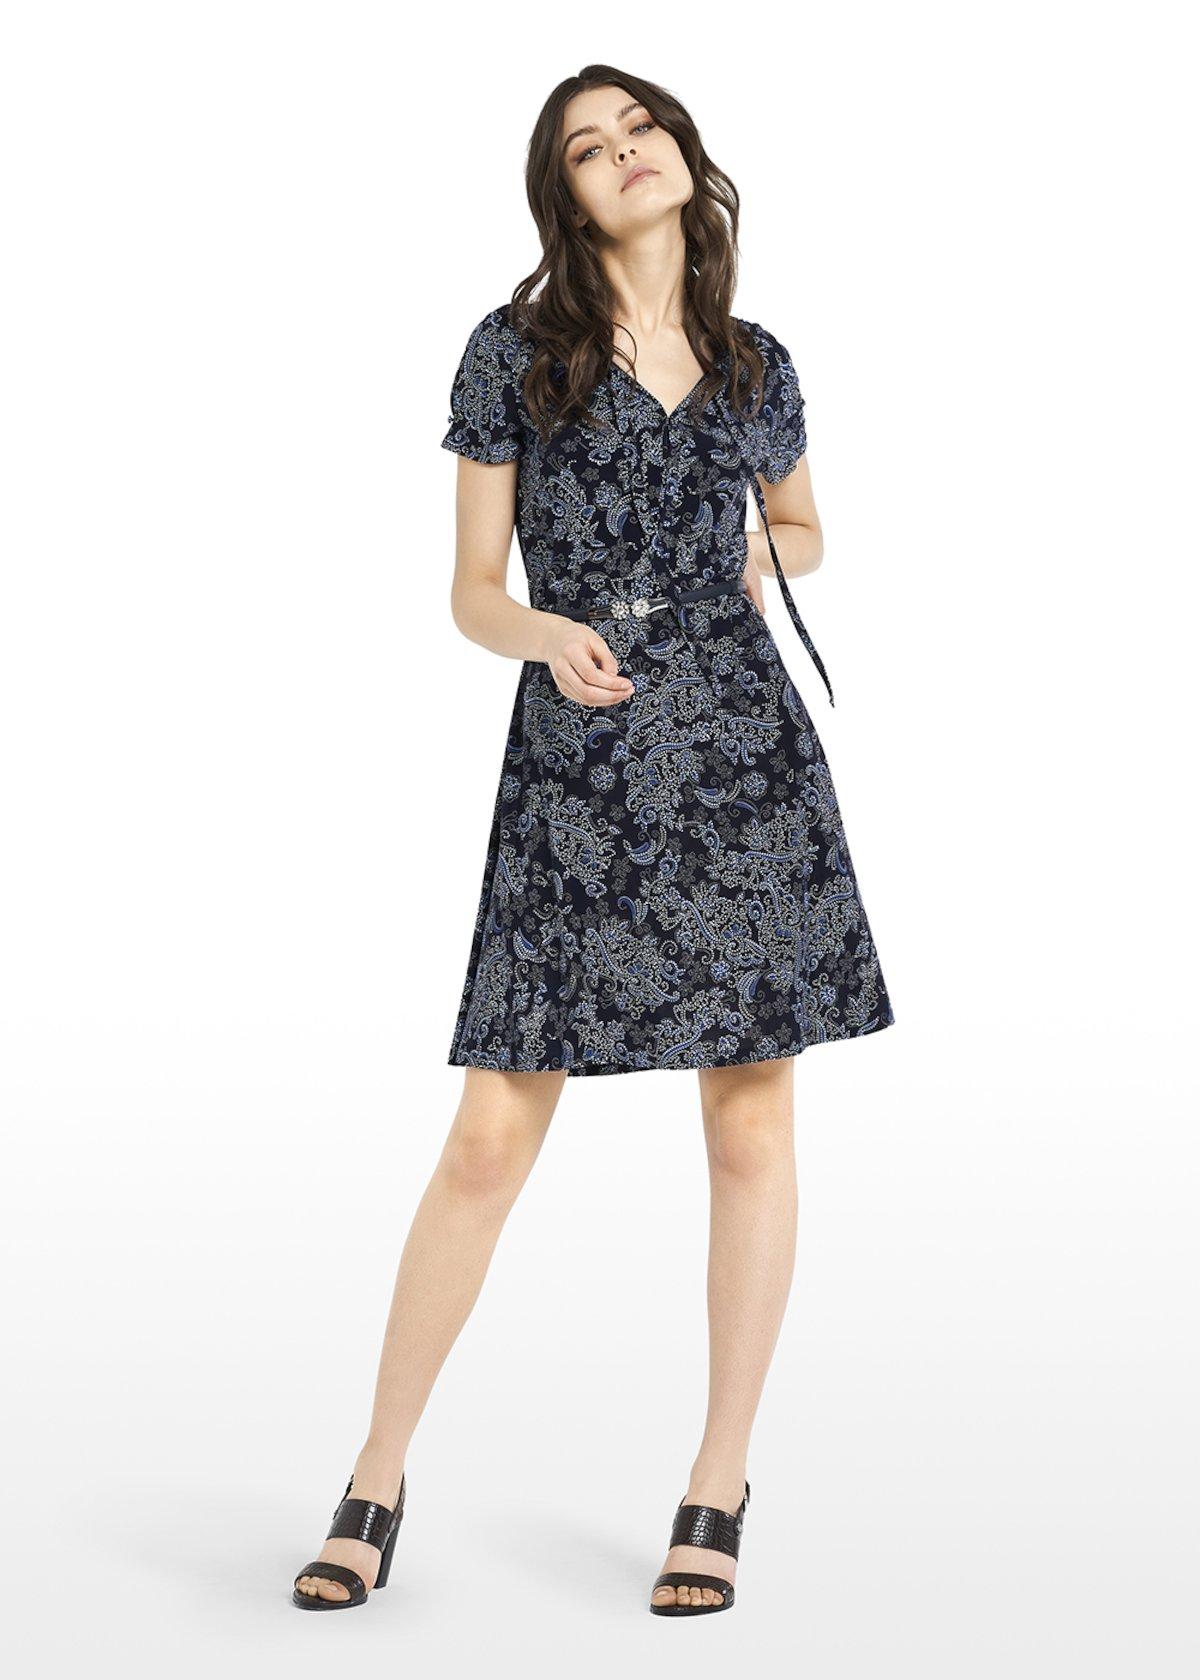 Jersey Afry dress Paisley pattern with bow - Blue / Avion Fantasia - Woman